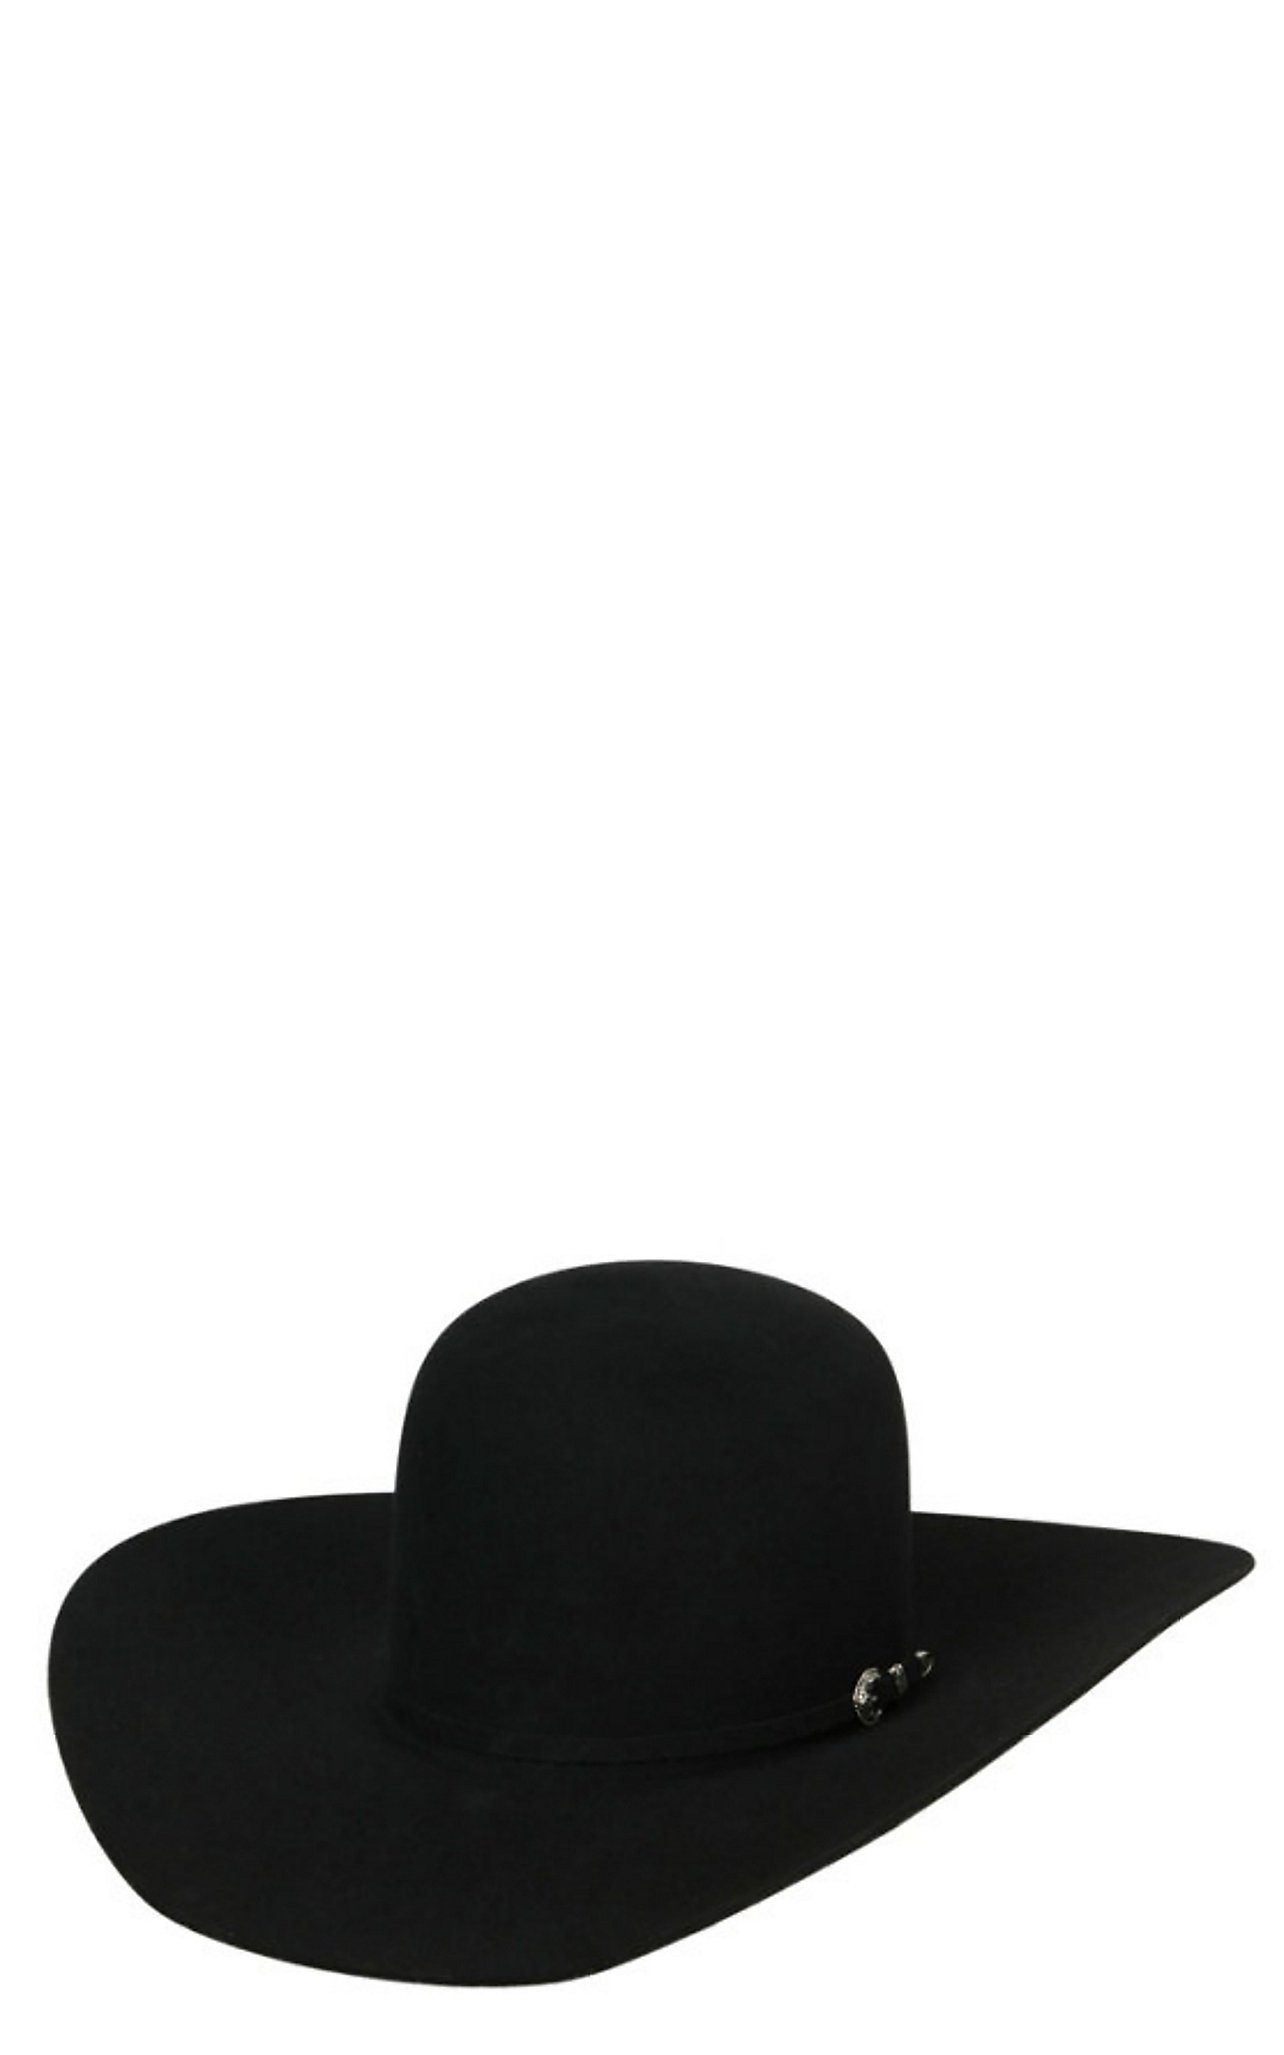 f33b05381b7 Rodeo King 7X Open Crown Black Felt Cowboy Hat 7XBLKOC45